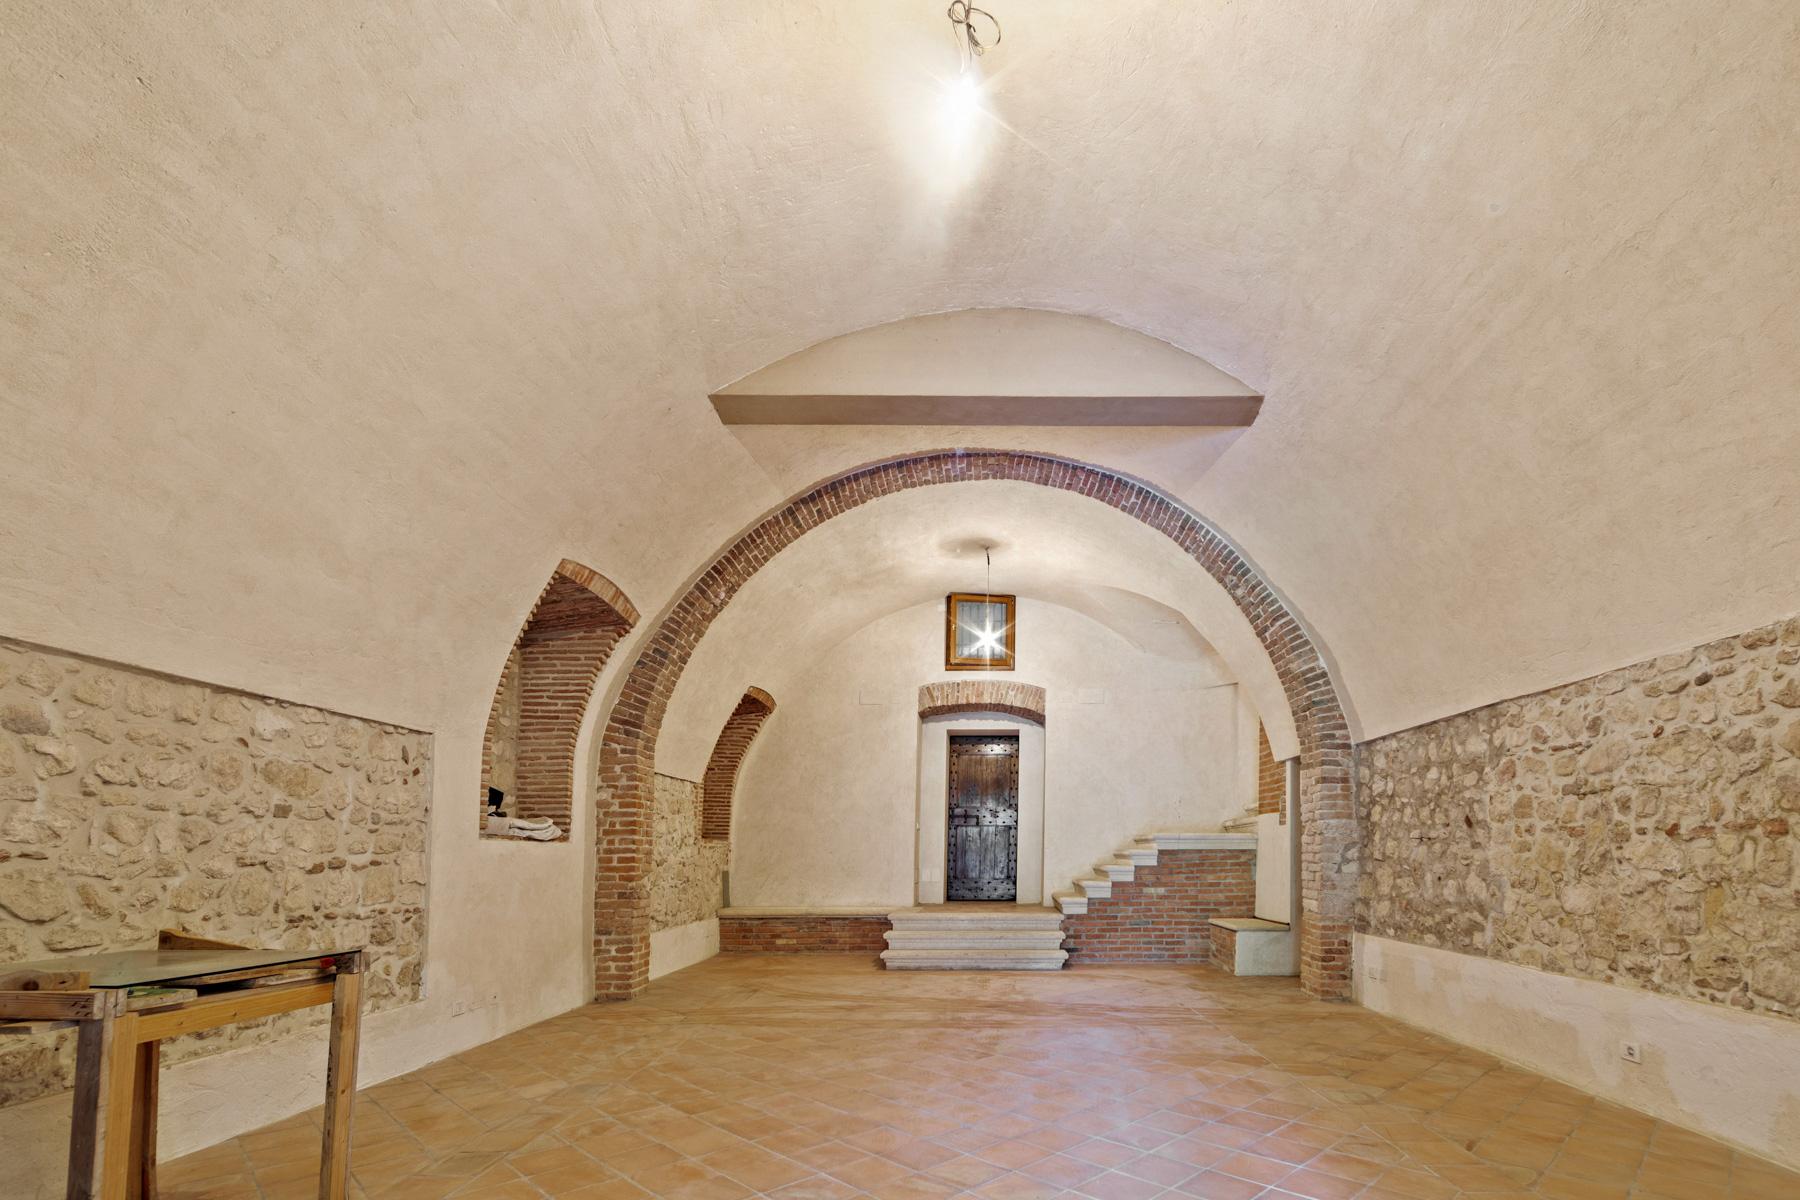 Villa in Vendita a Verona: 5 locali, 890 mq - Foto 8